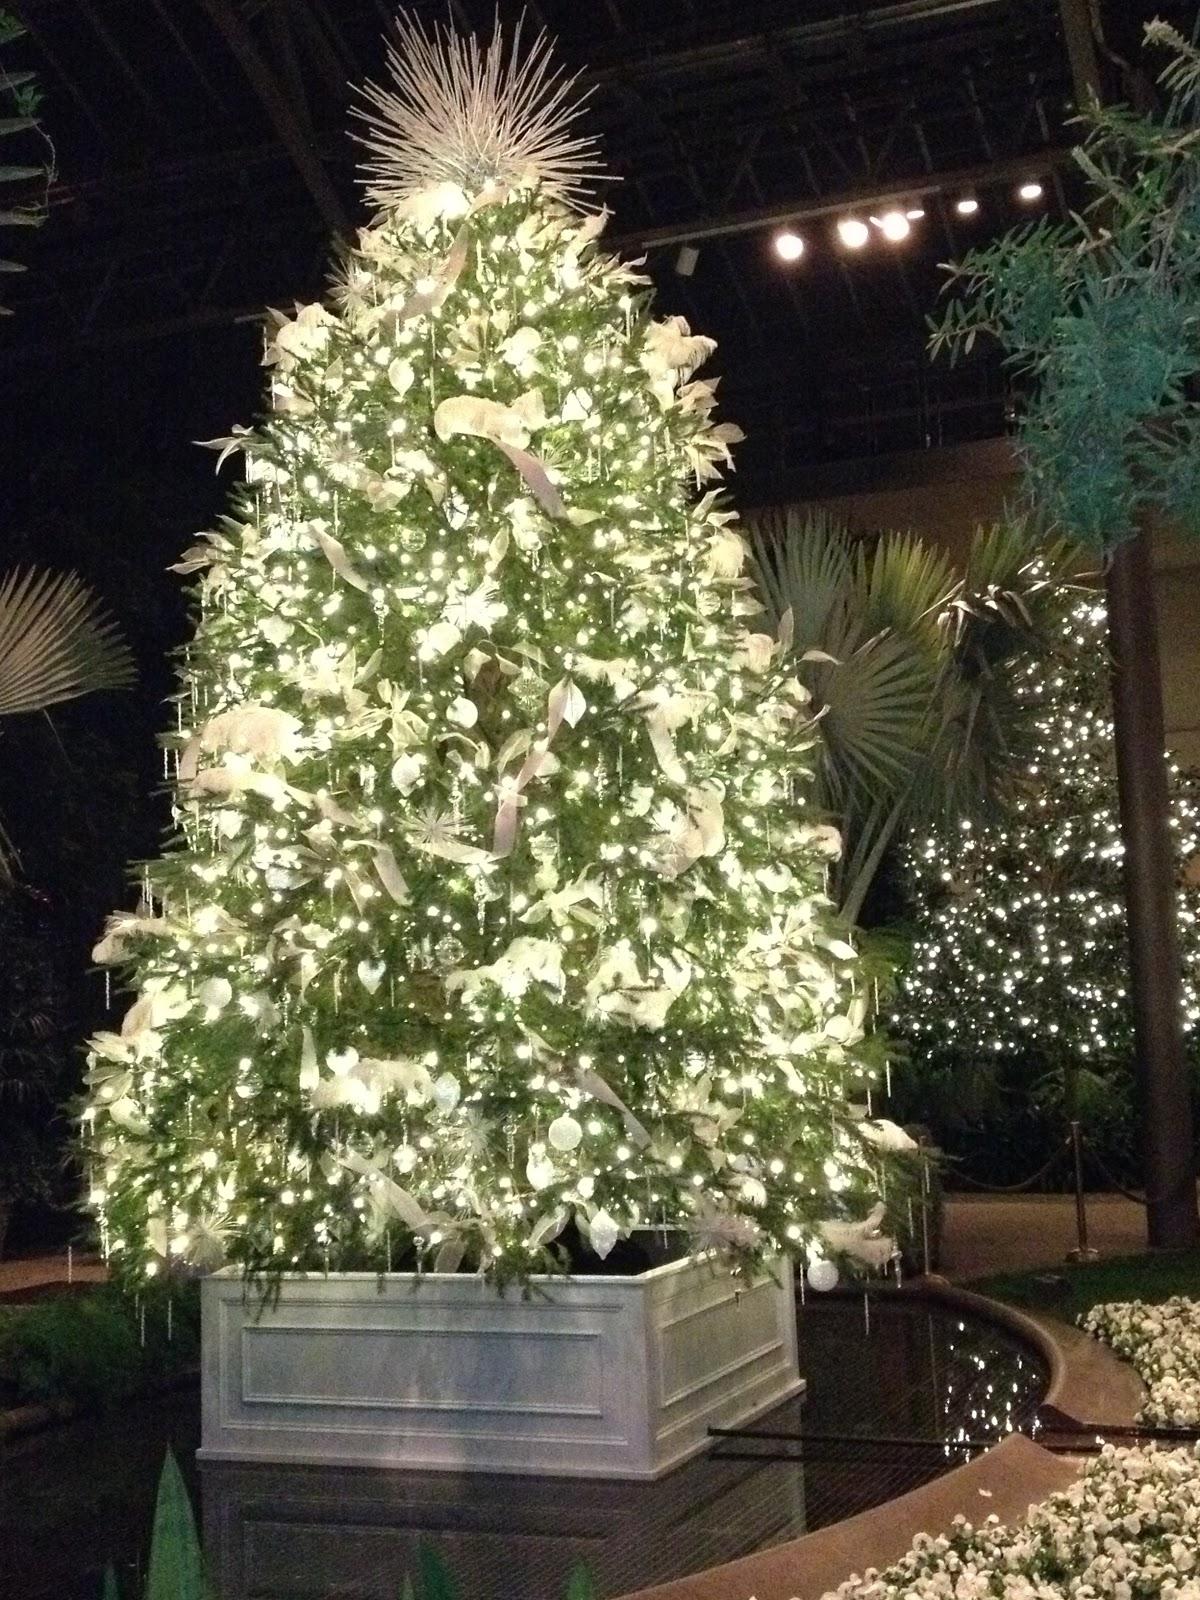 My City Garden: A Longwood Christmas - Trees